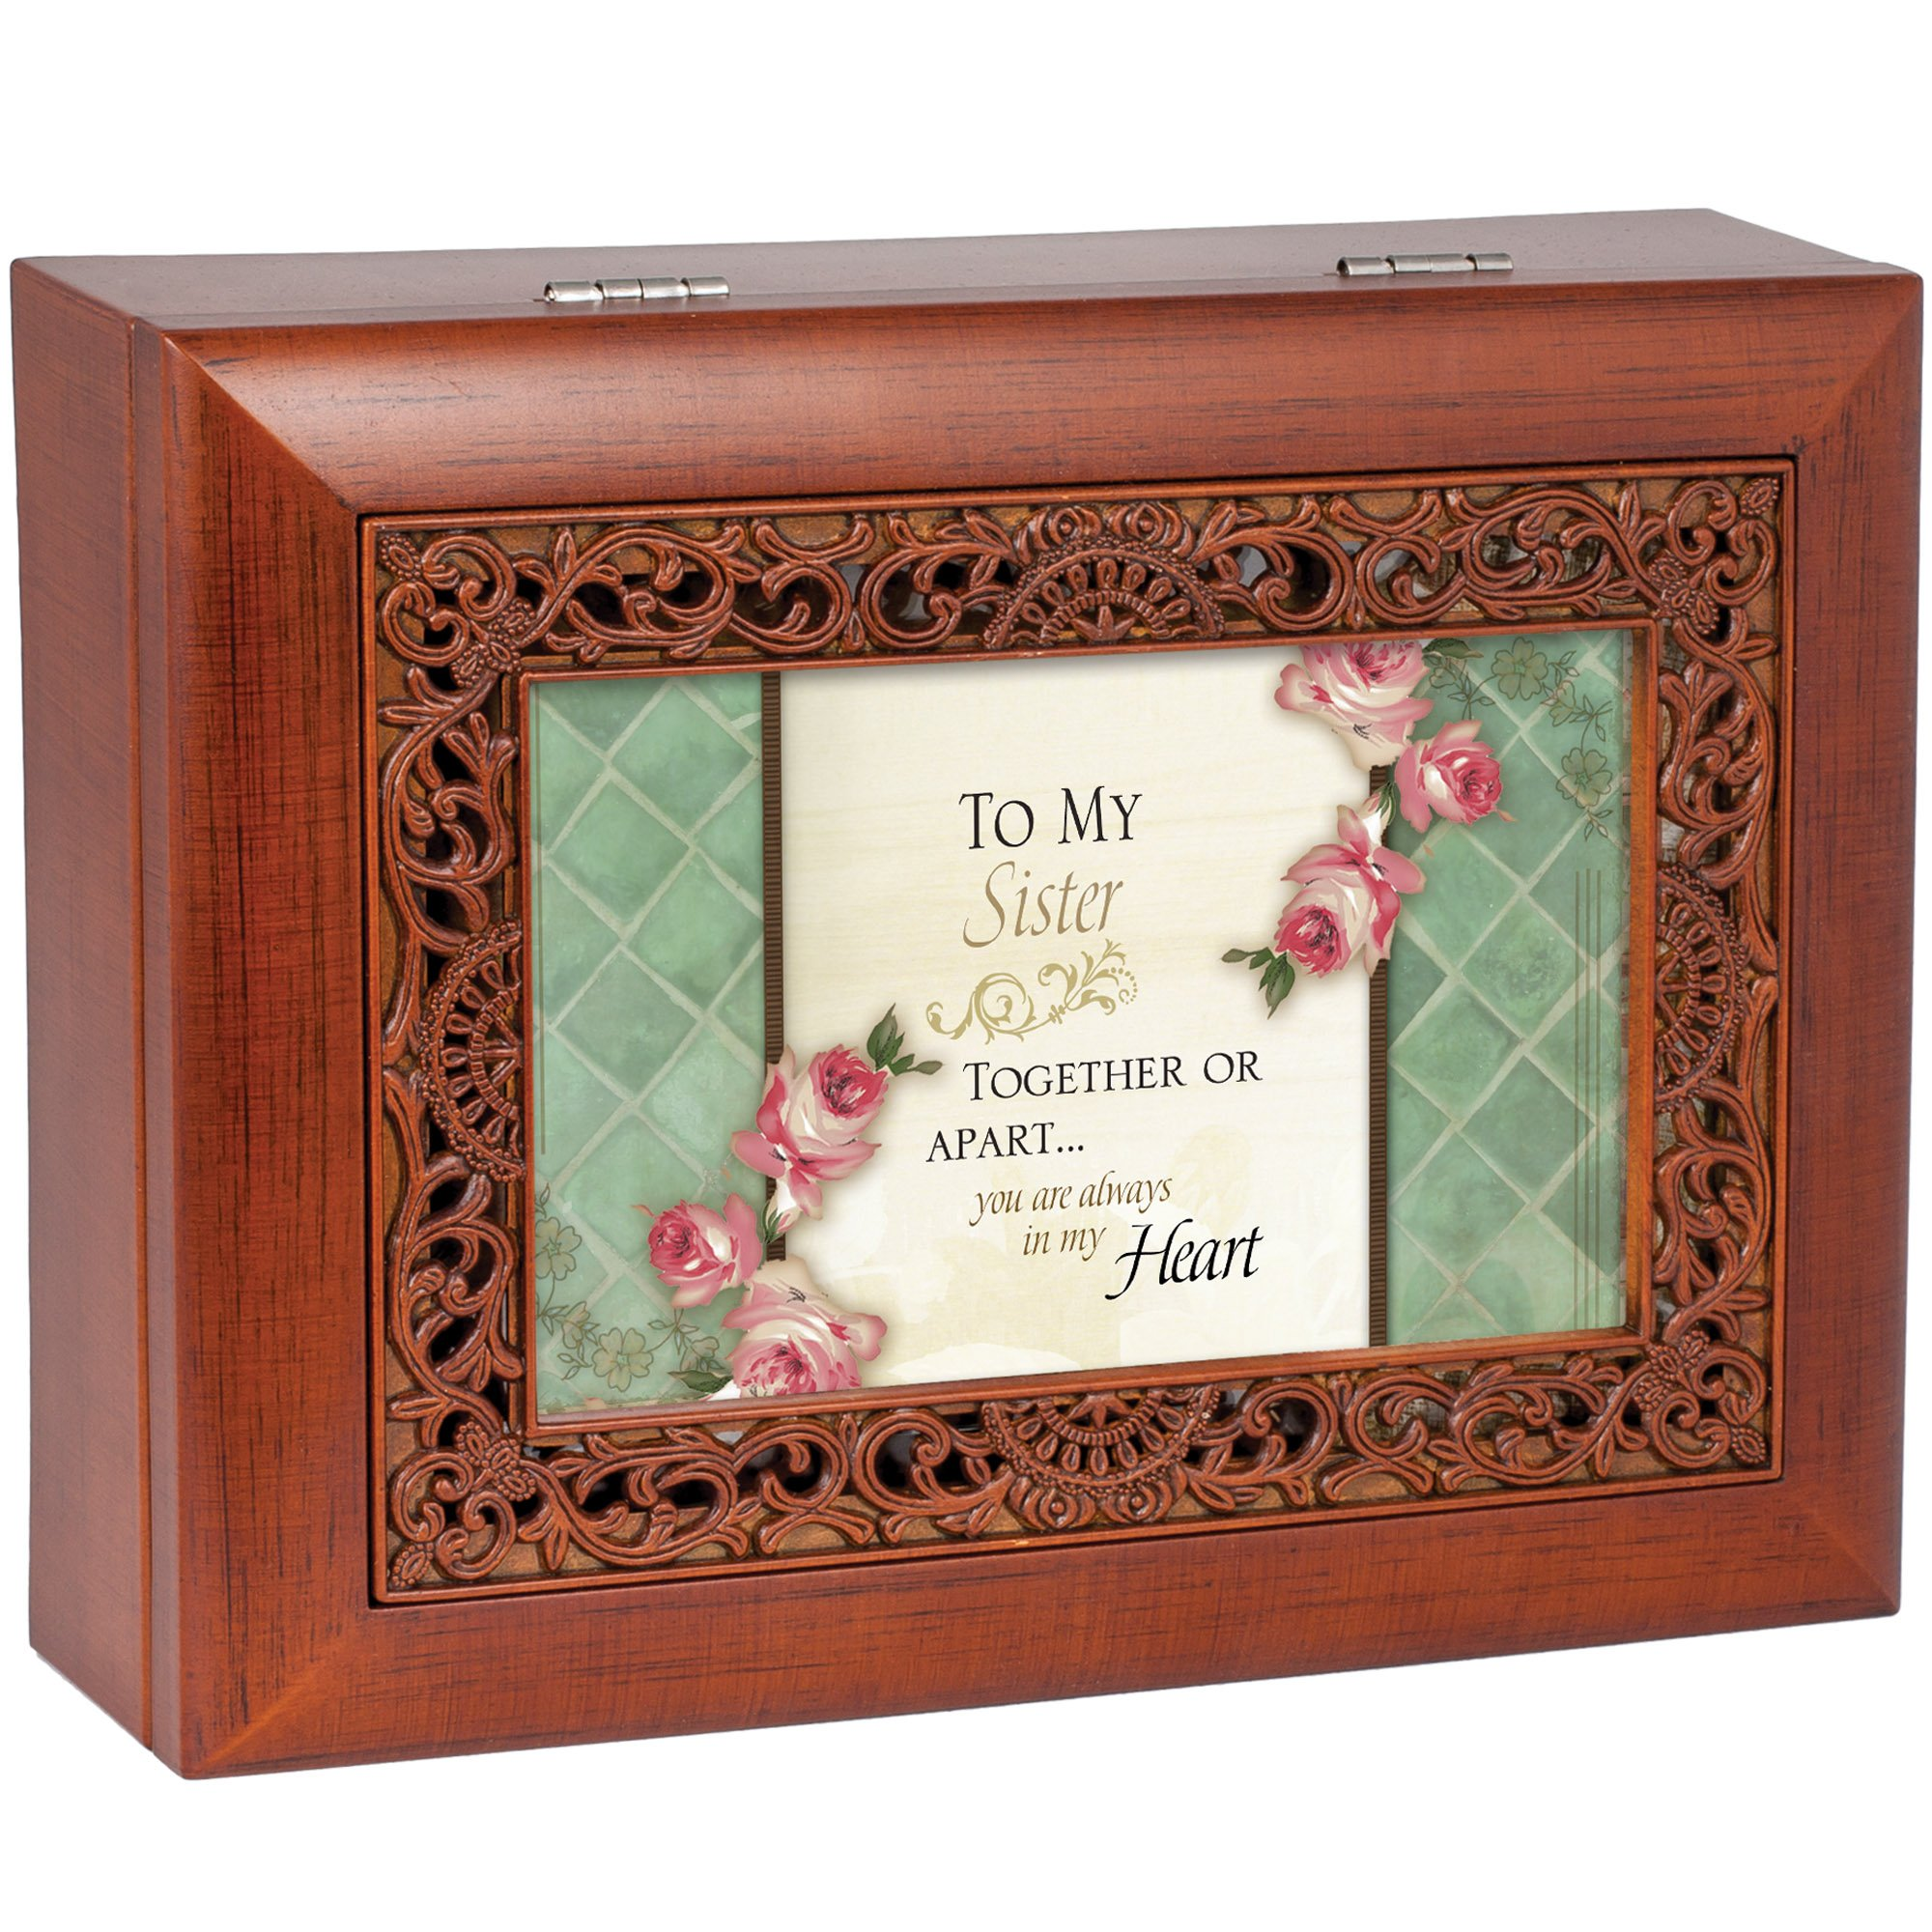 Cottage Garden Sister Woodgrain Ornate Music Box Plays Wonderful World by Cottage Garden (Image #3)